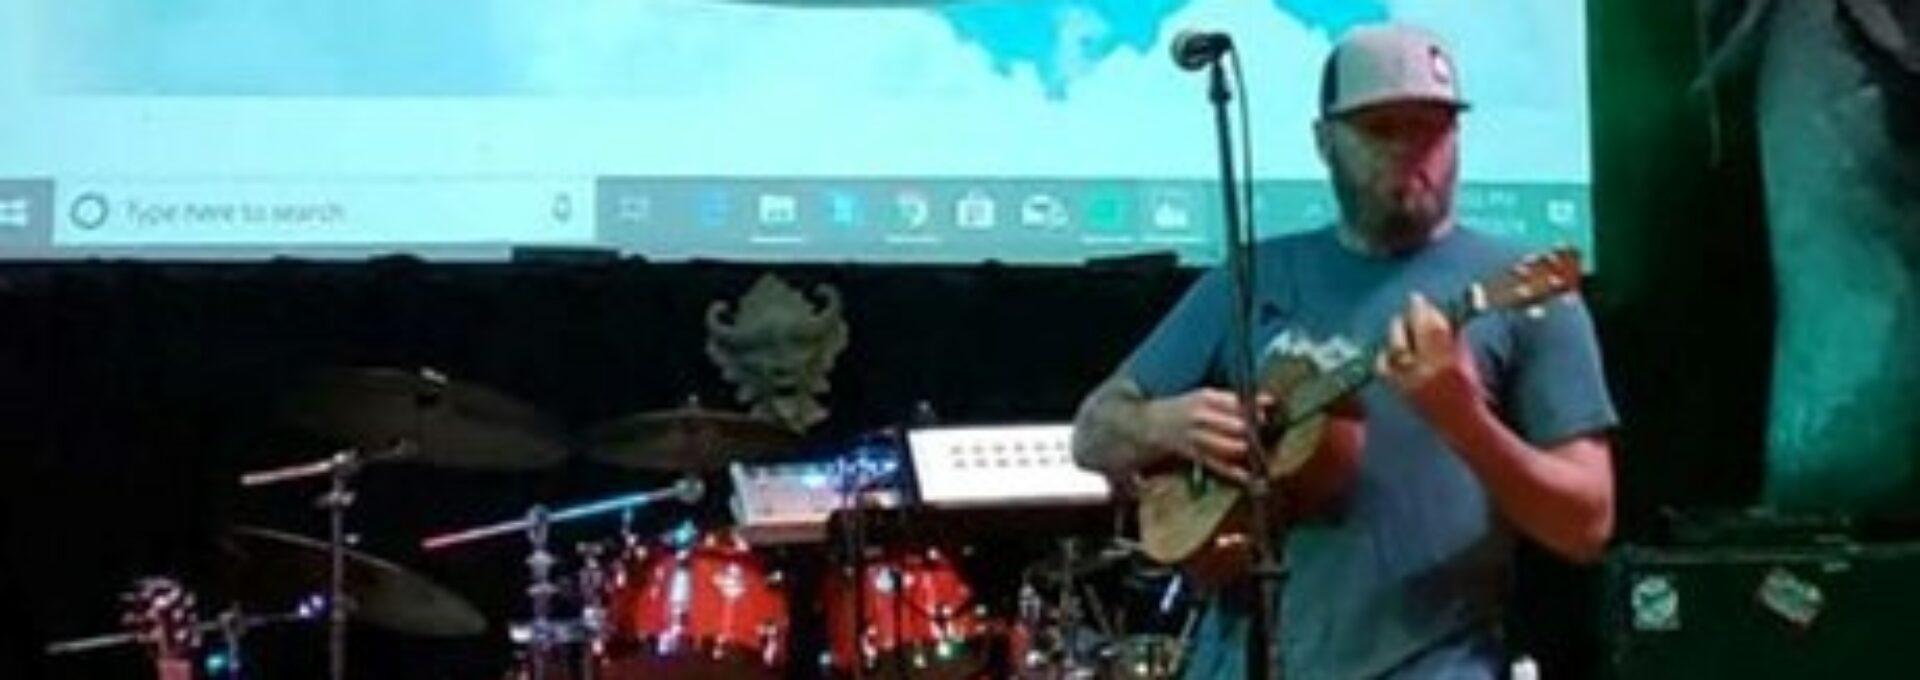 Jeremy Abbott Music